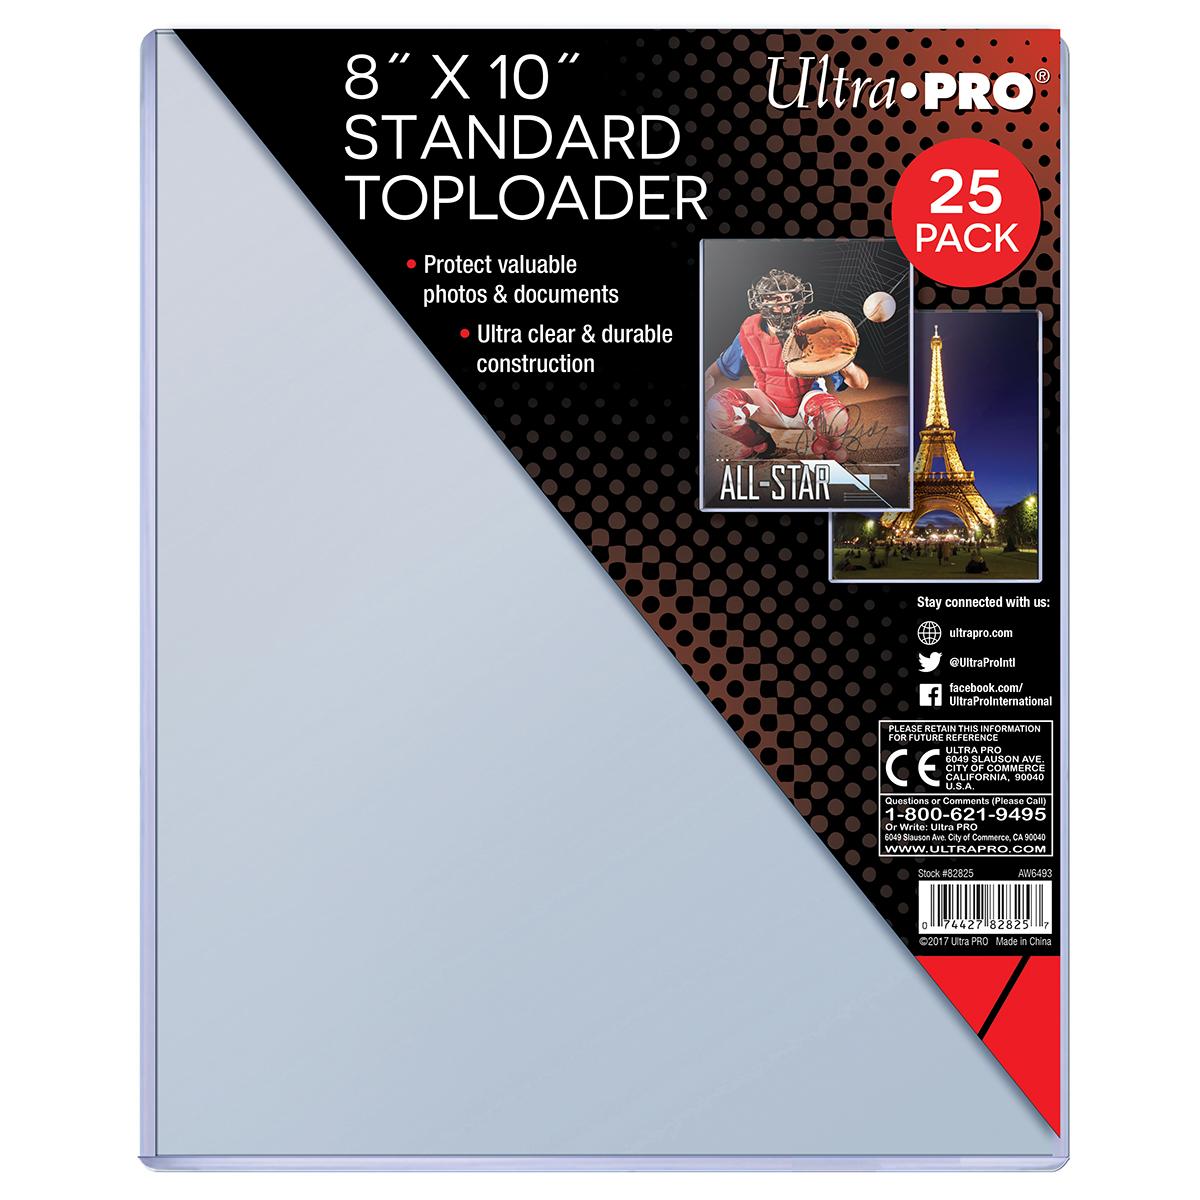 "8"" X 10"" Toploader 25ct, Ultra PRO"